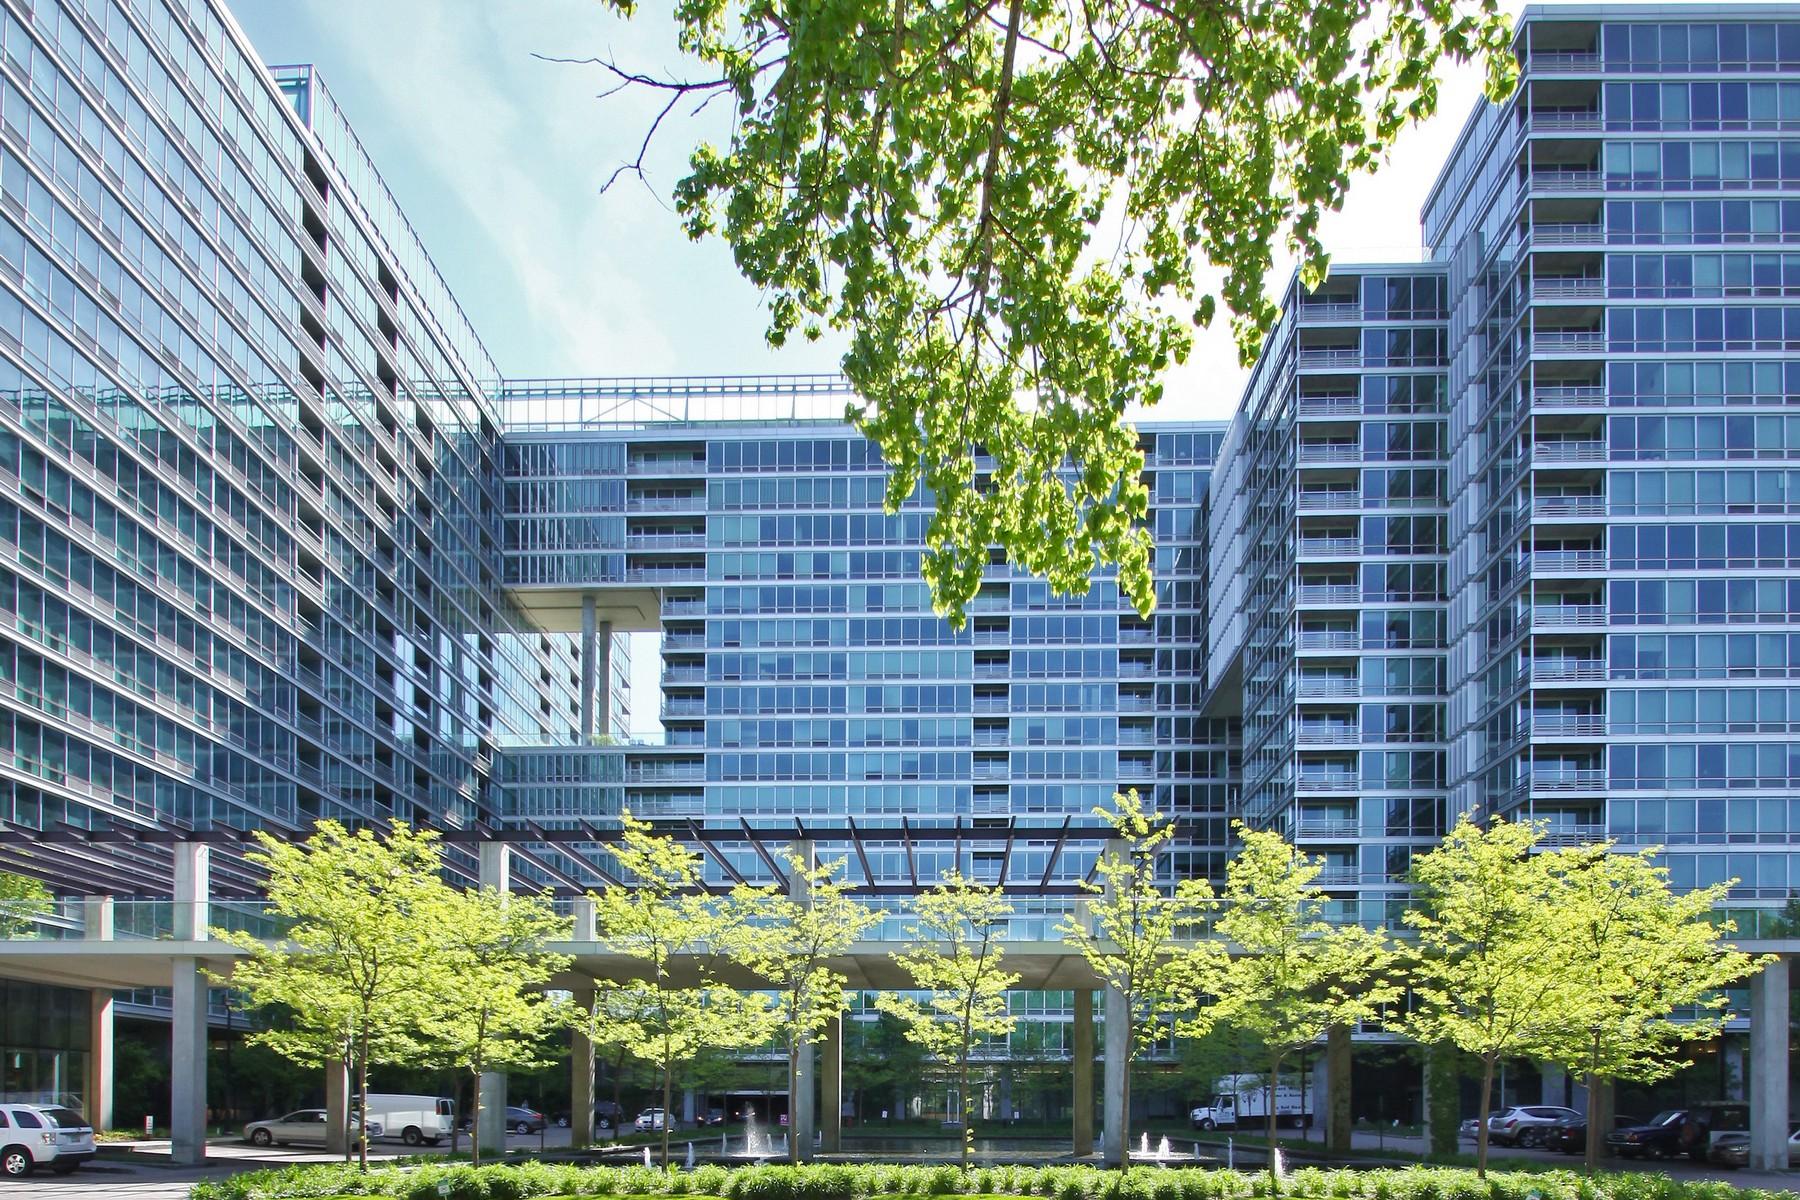 Condominium for Sale at Magnificent Penthouse 9655 Woods Drive Unit 1910 Skokie, Illinois 60077 United States